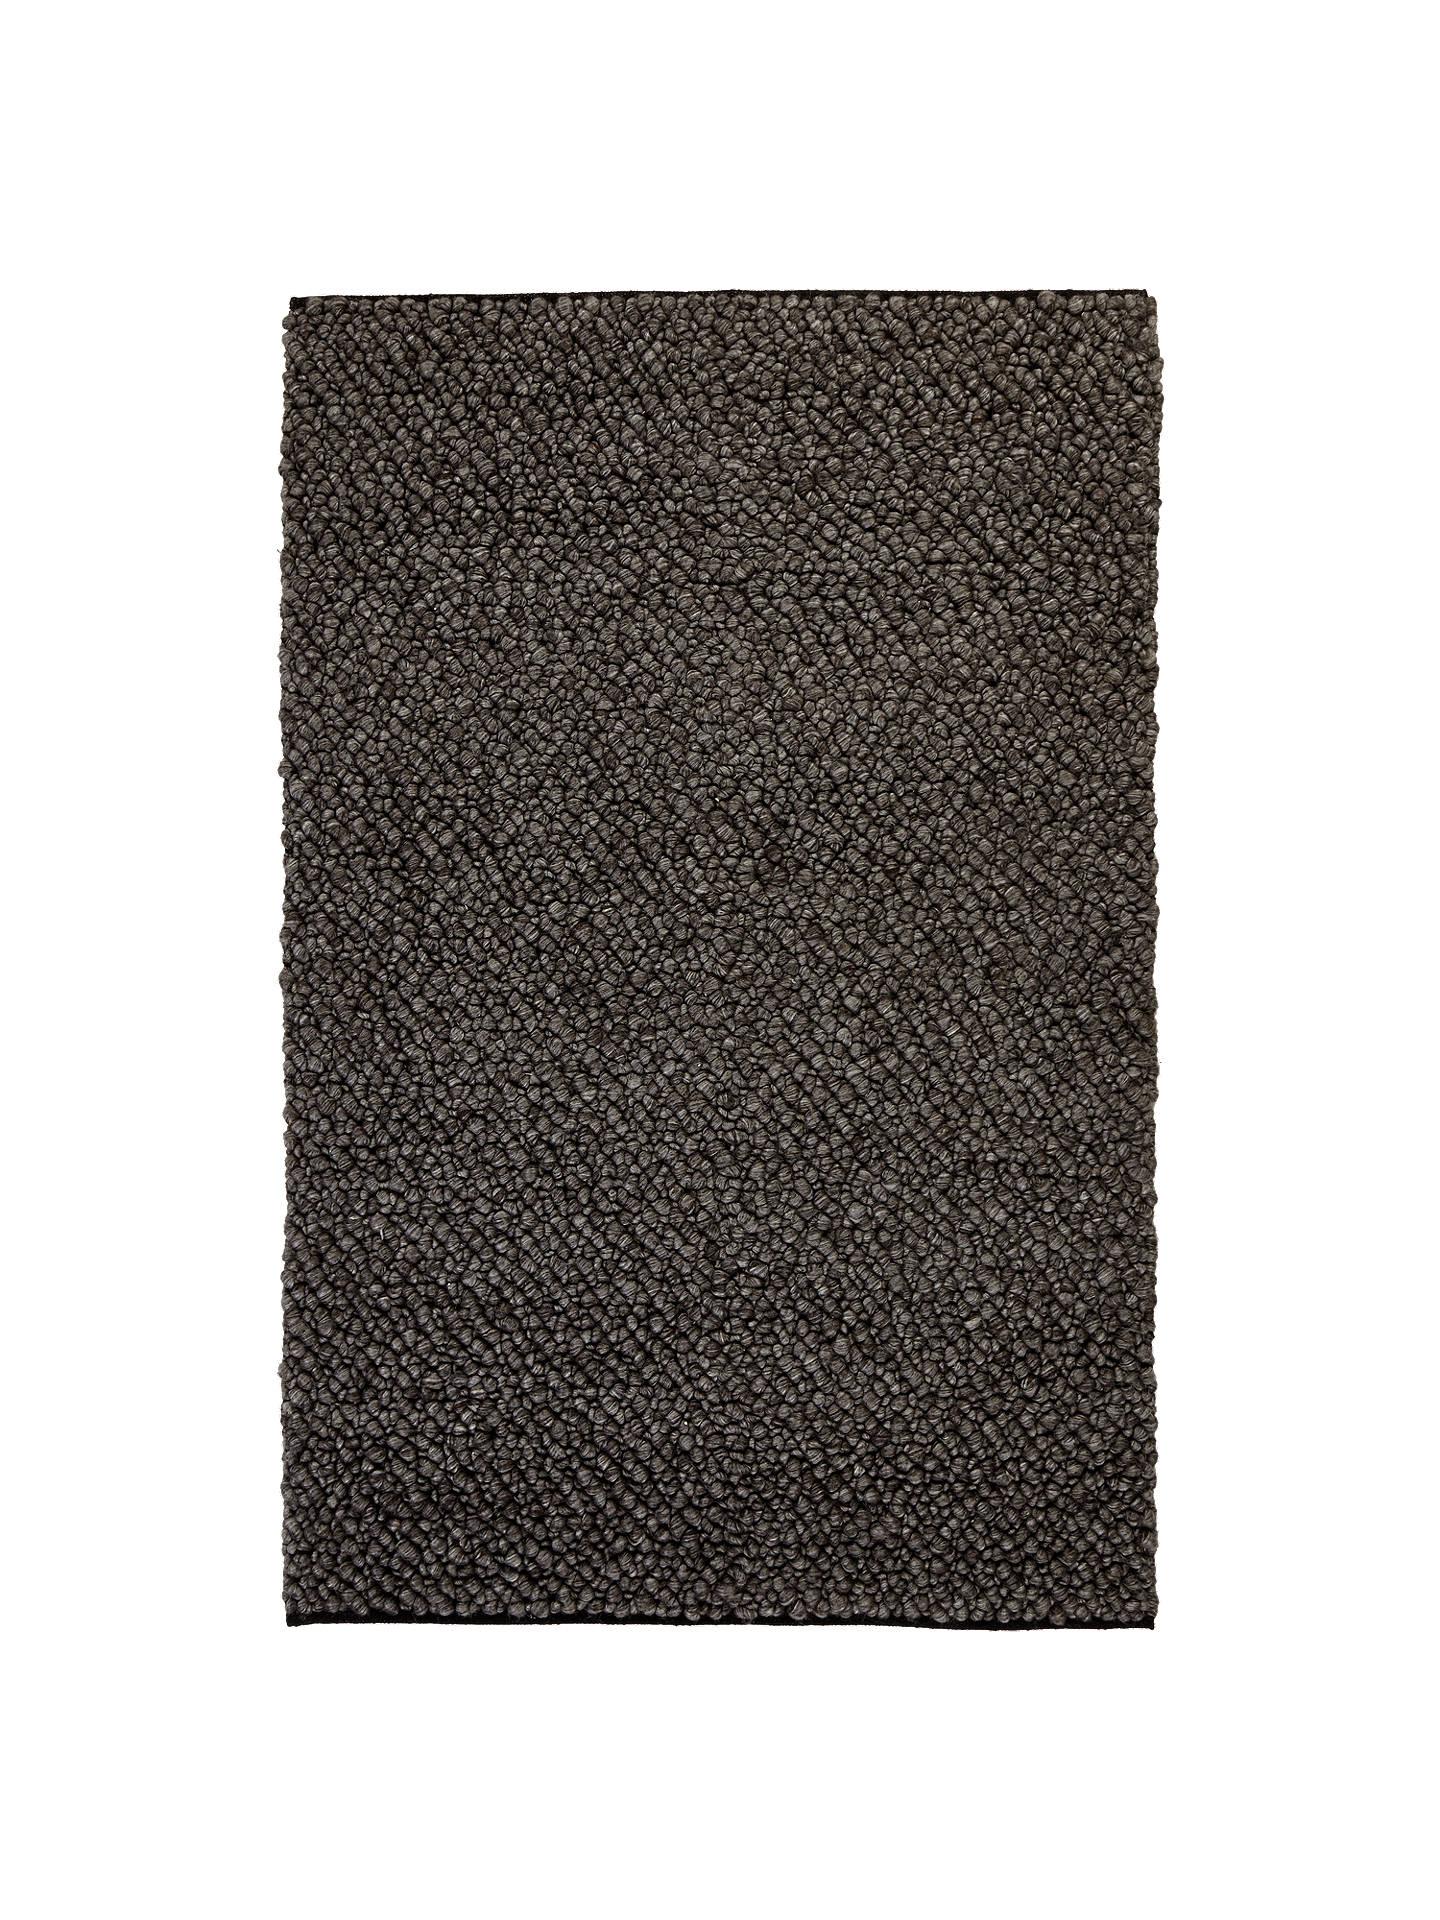 Buyjohn lewis partners barra rug slate l180 x w120cm online at johnlewis